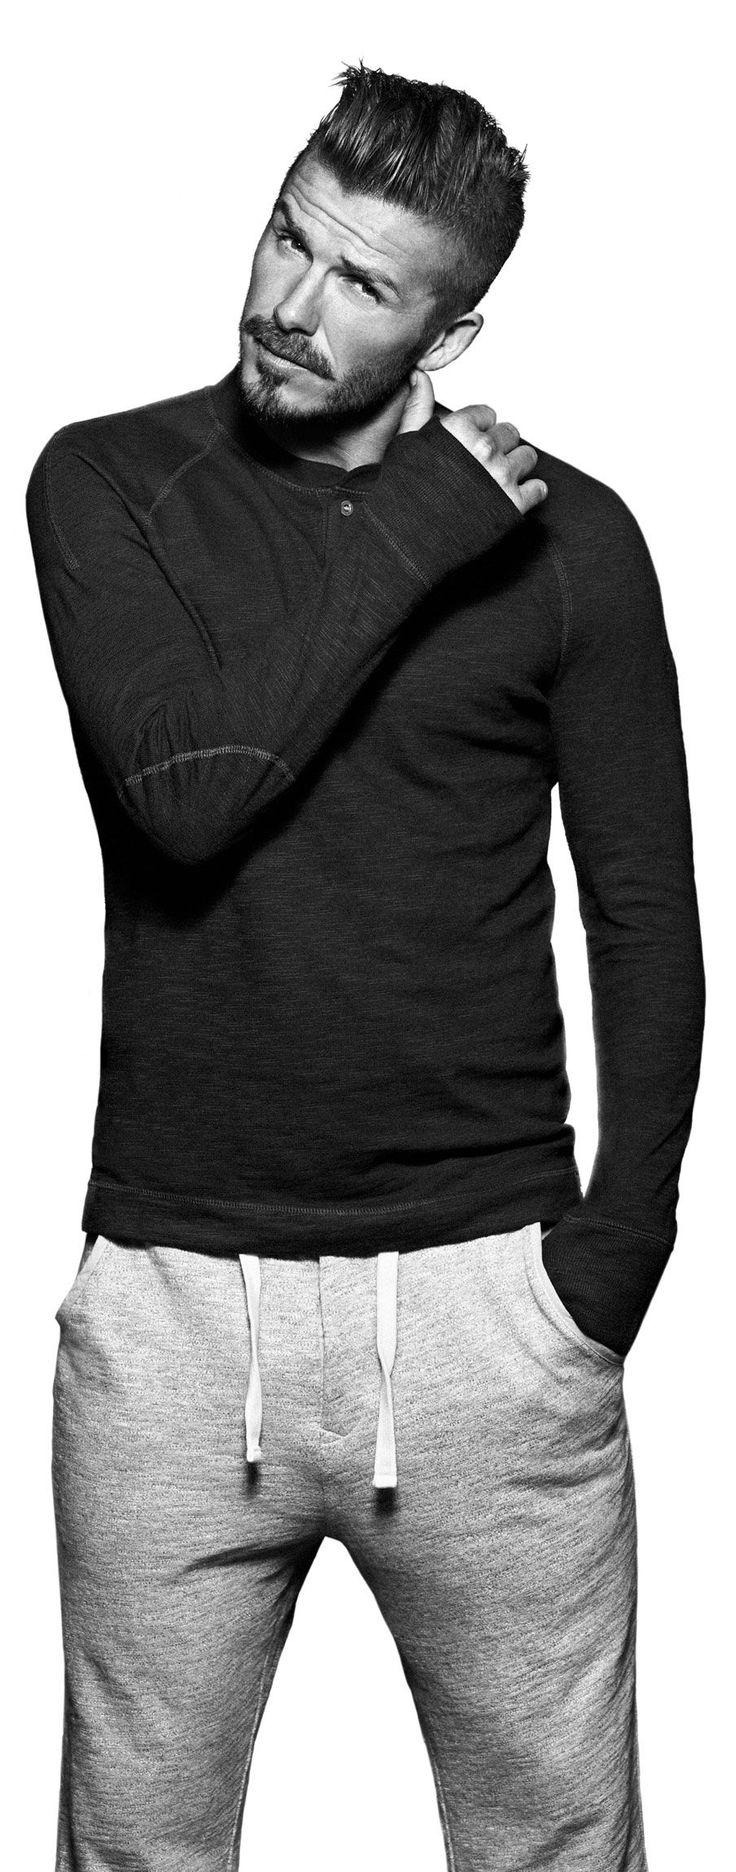 Casual Weekend Wear | Guys Winter Fashion